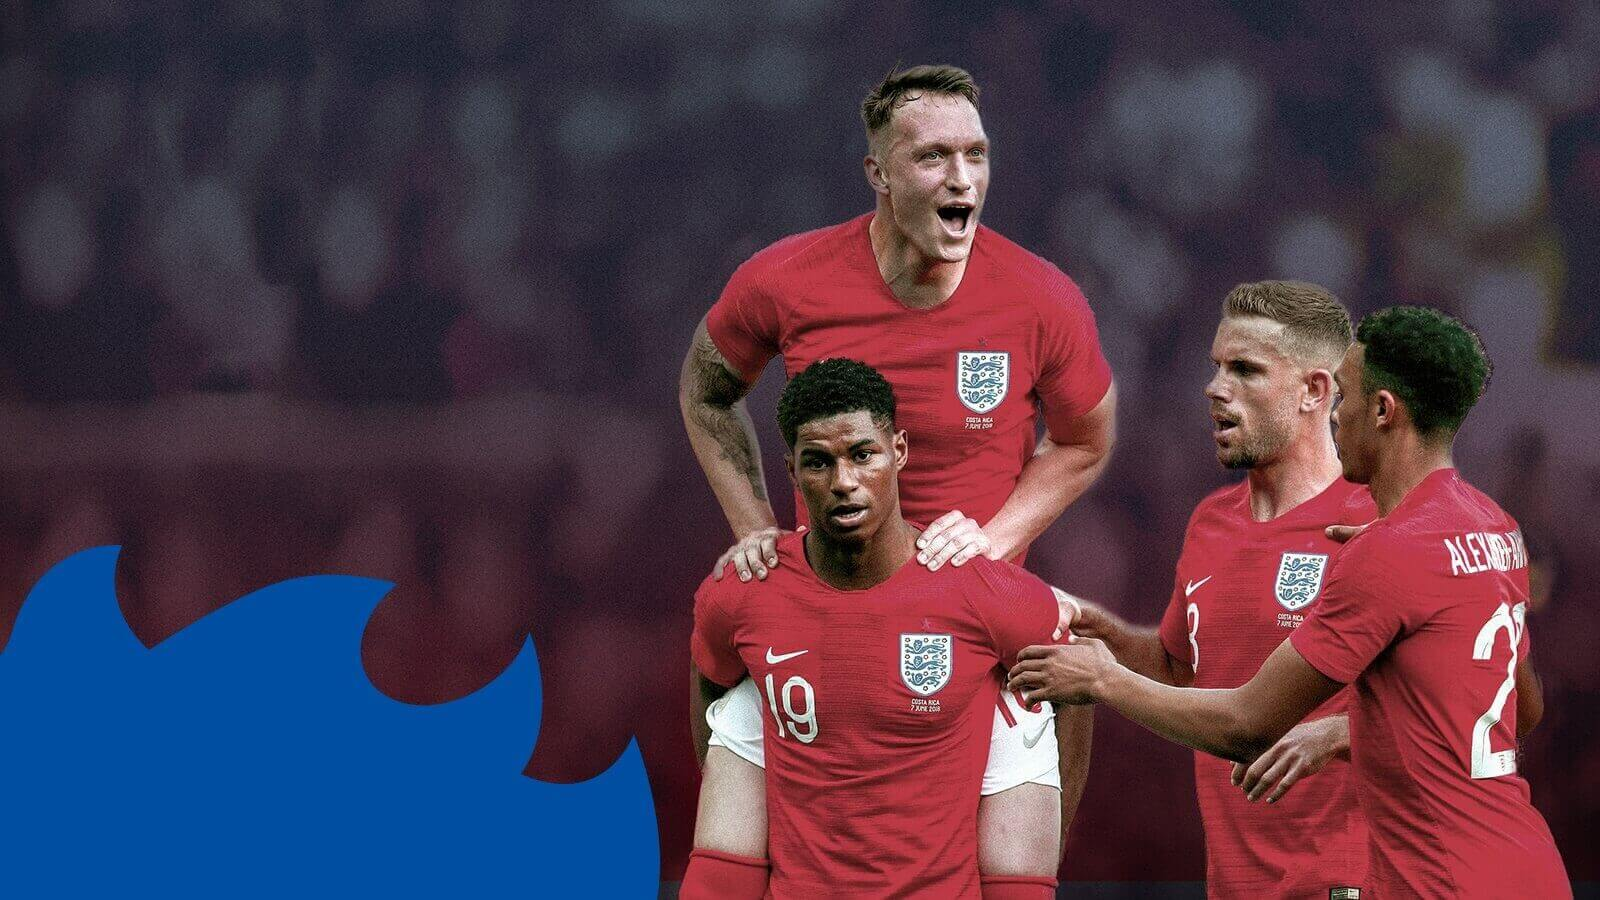 The England Men S Senior Football Team